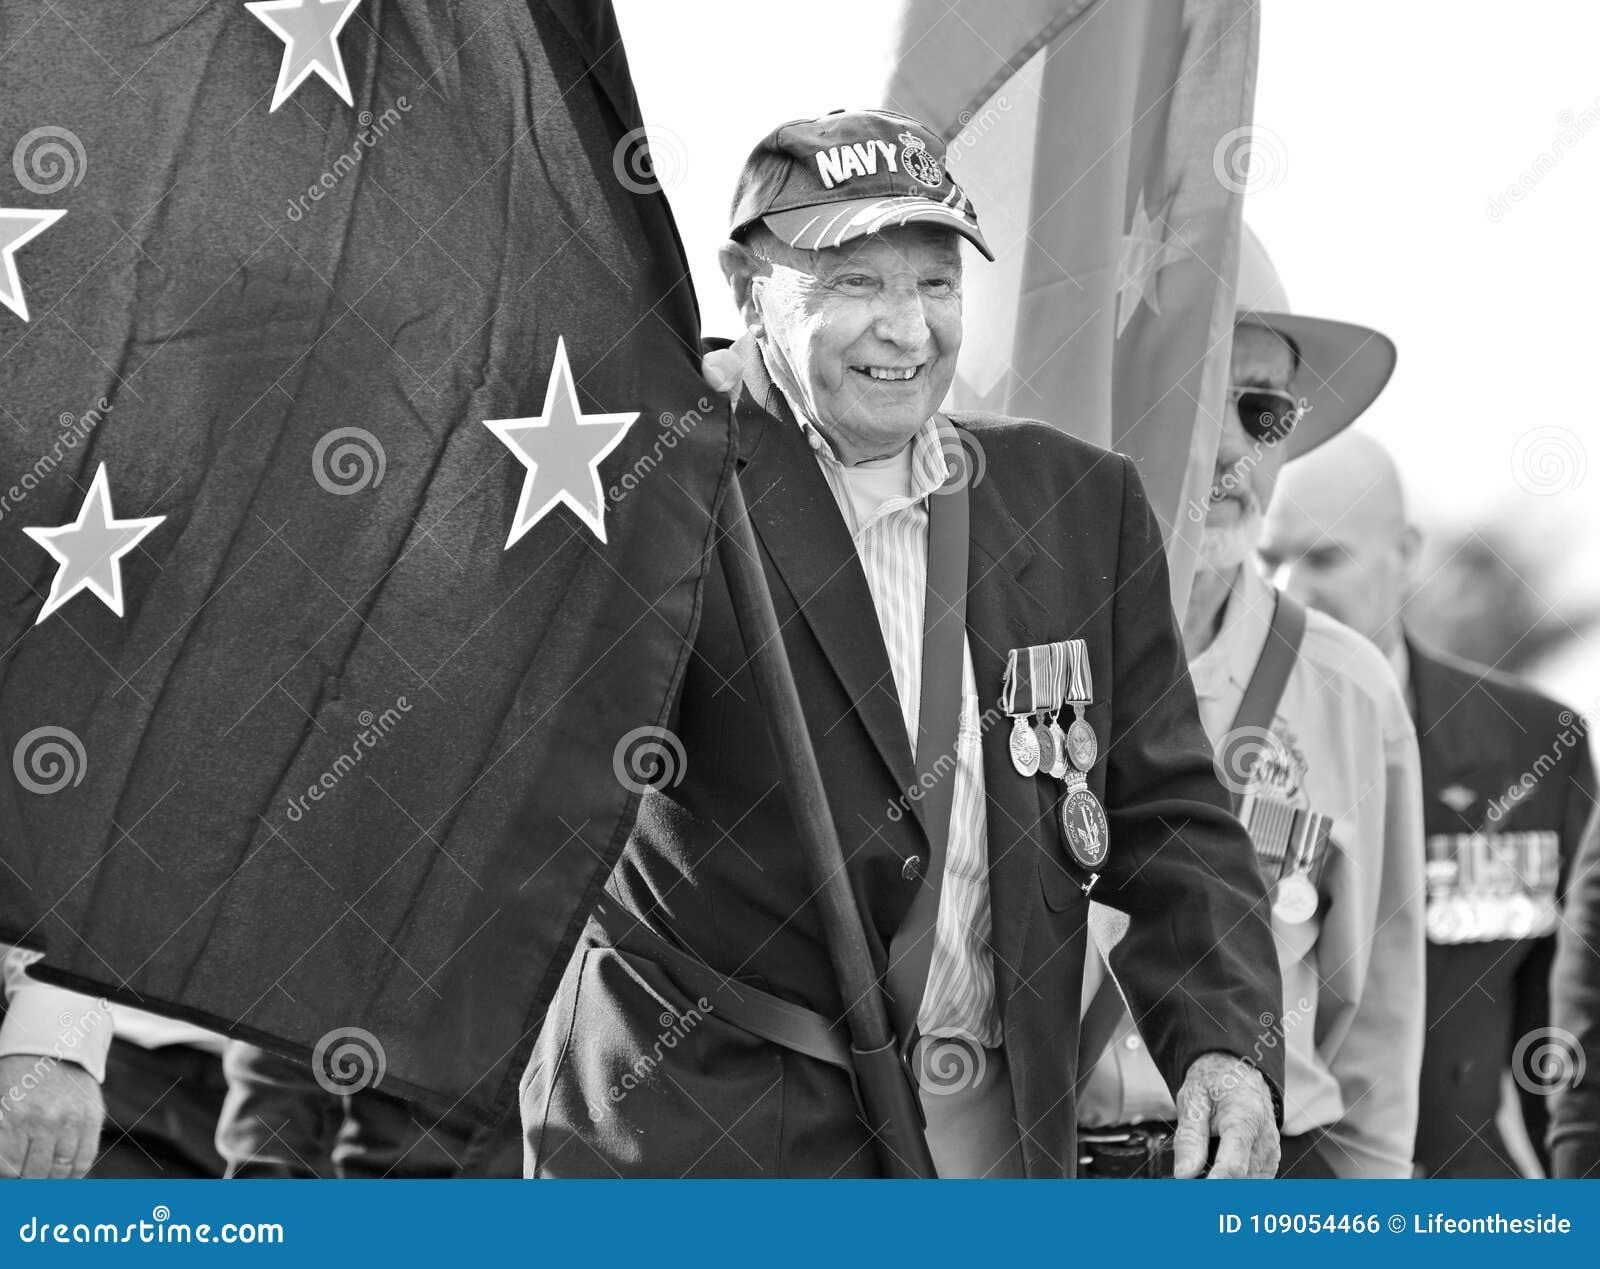 Old Australian Navy veteran leads Anzac Day parade flag bearer